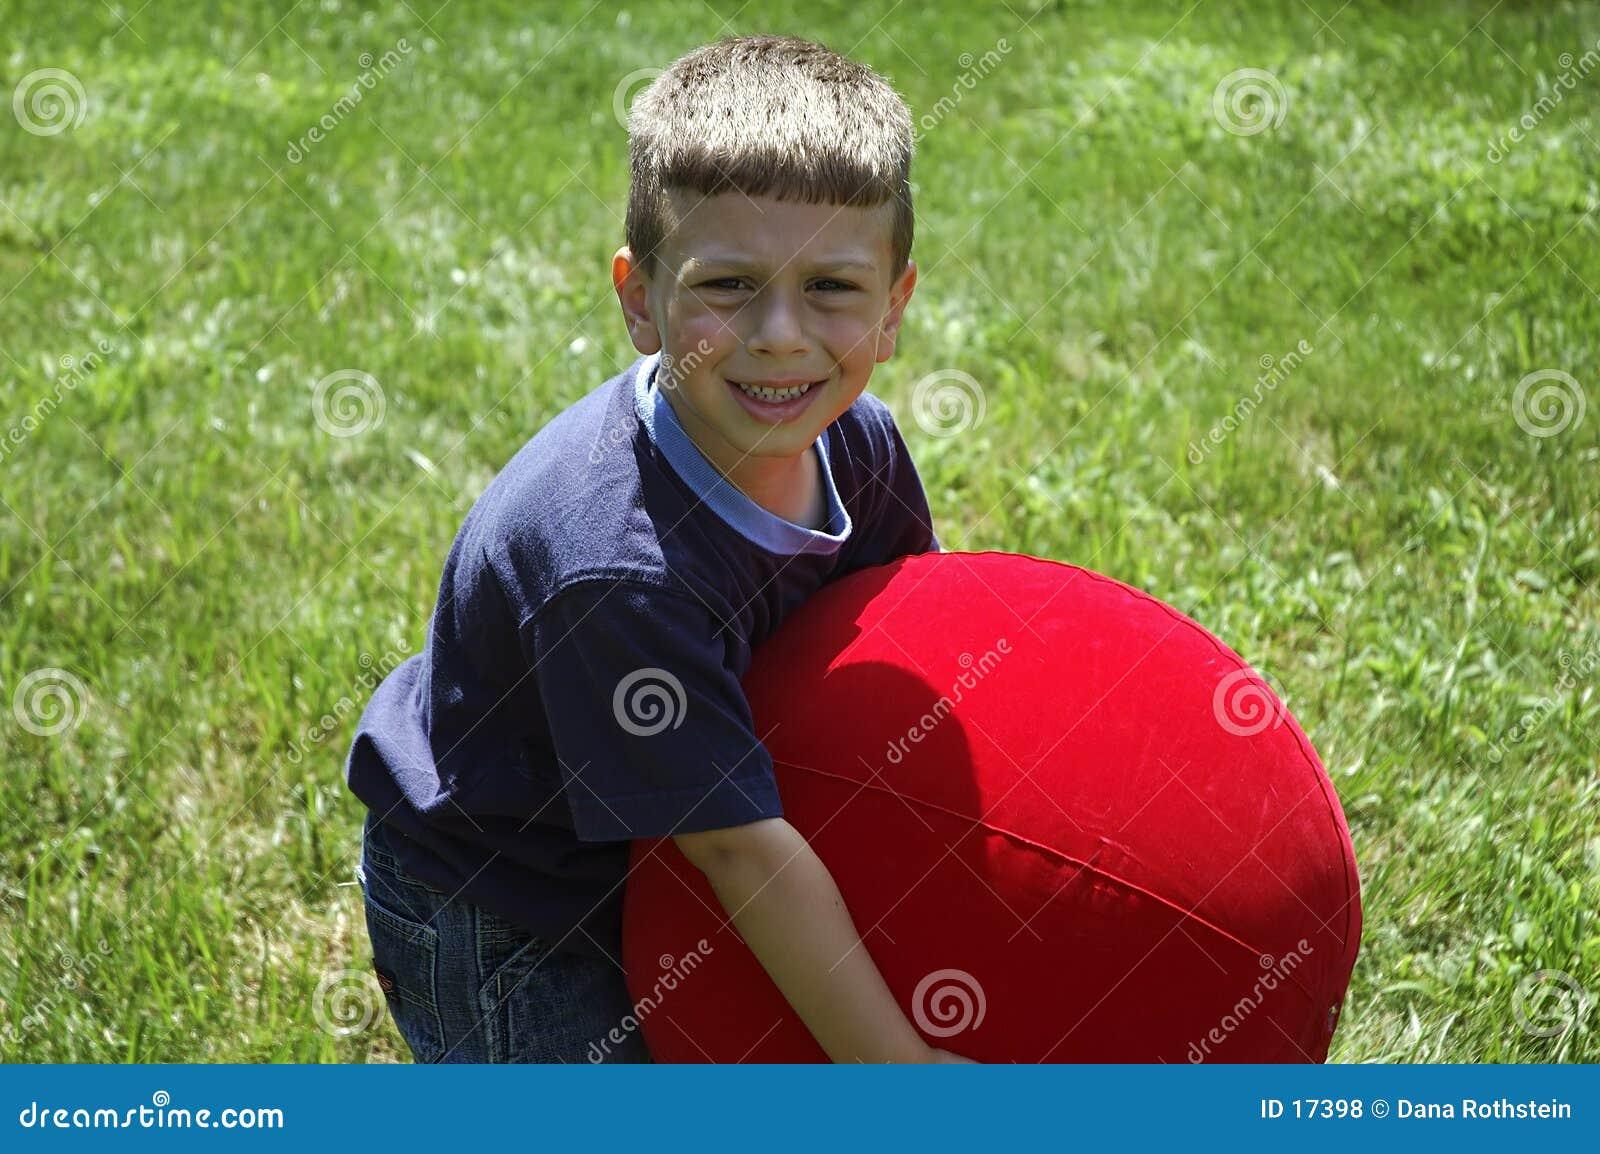 Toddler Lifting Ball